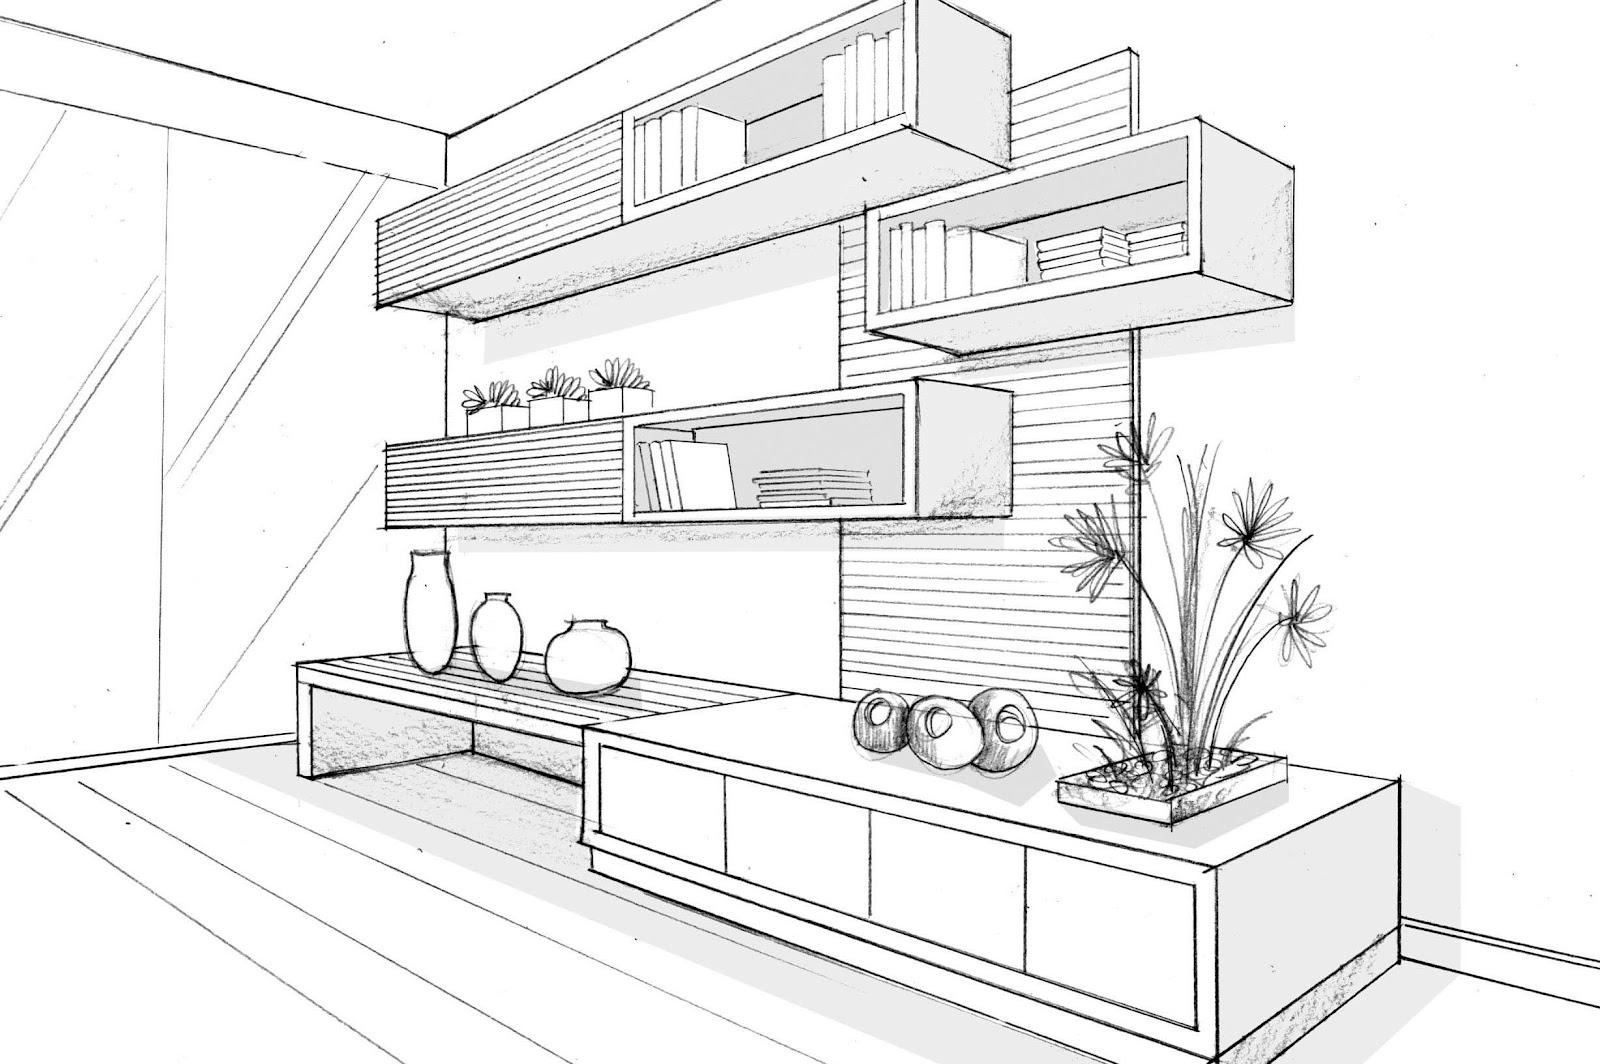 JOANA PAULA NOGUEIRA ARQUITETURA DESIGN: Abril 2012 #3F3F3F 1600 1064